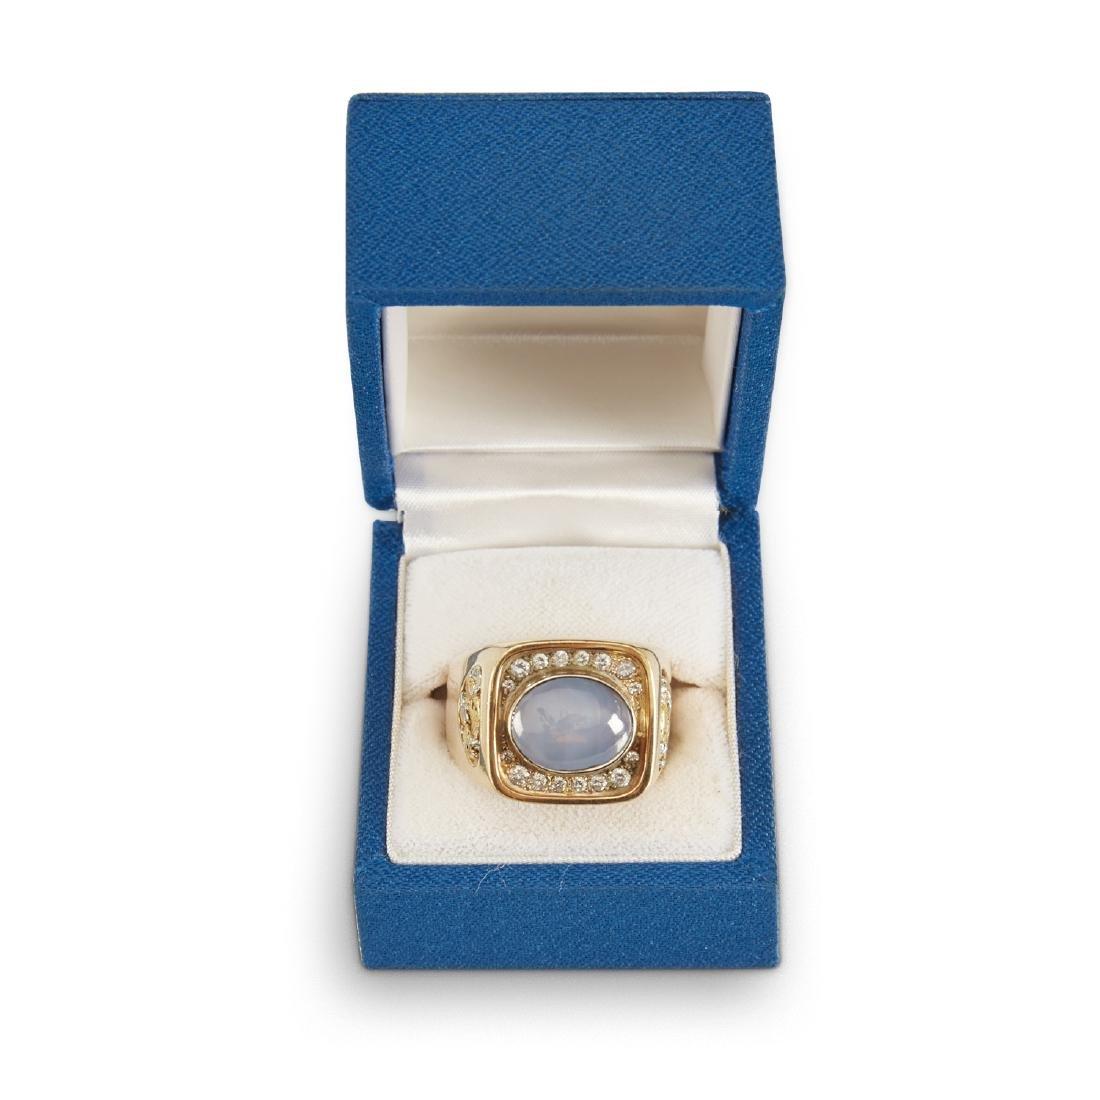 A Gent's 18k Gold, Diamond & Star Sapphire Ring